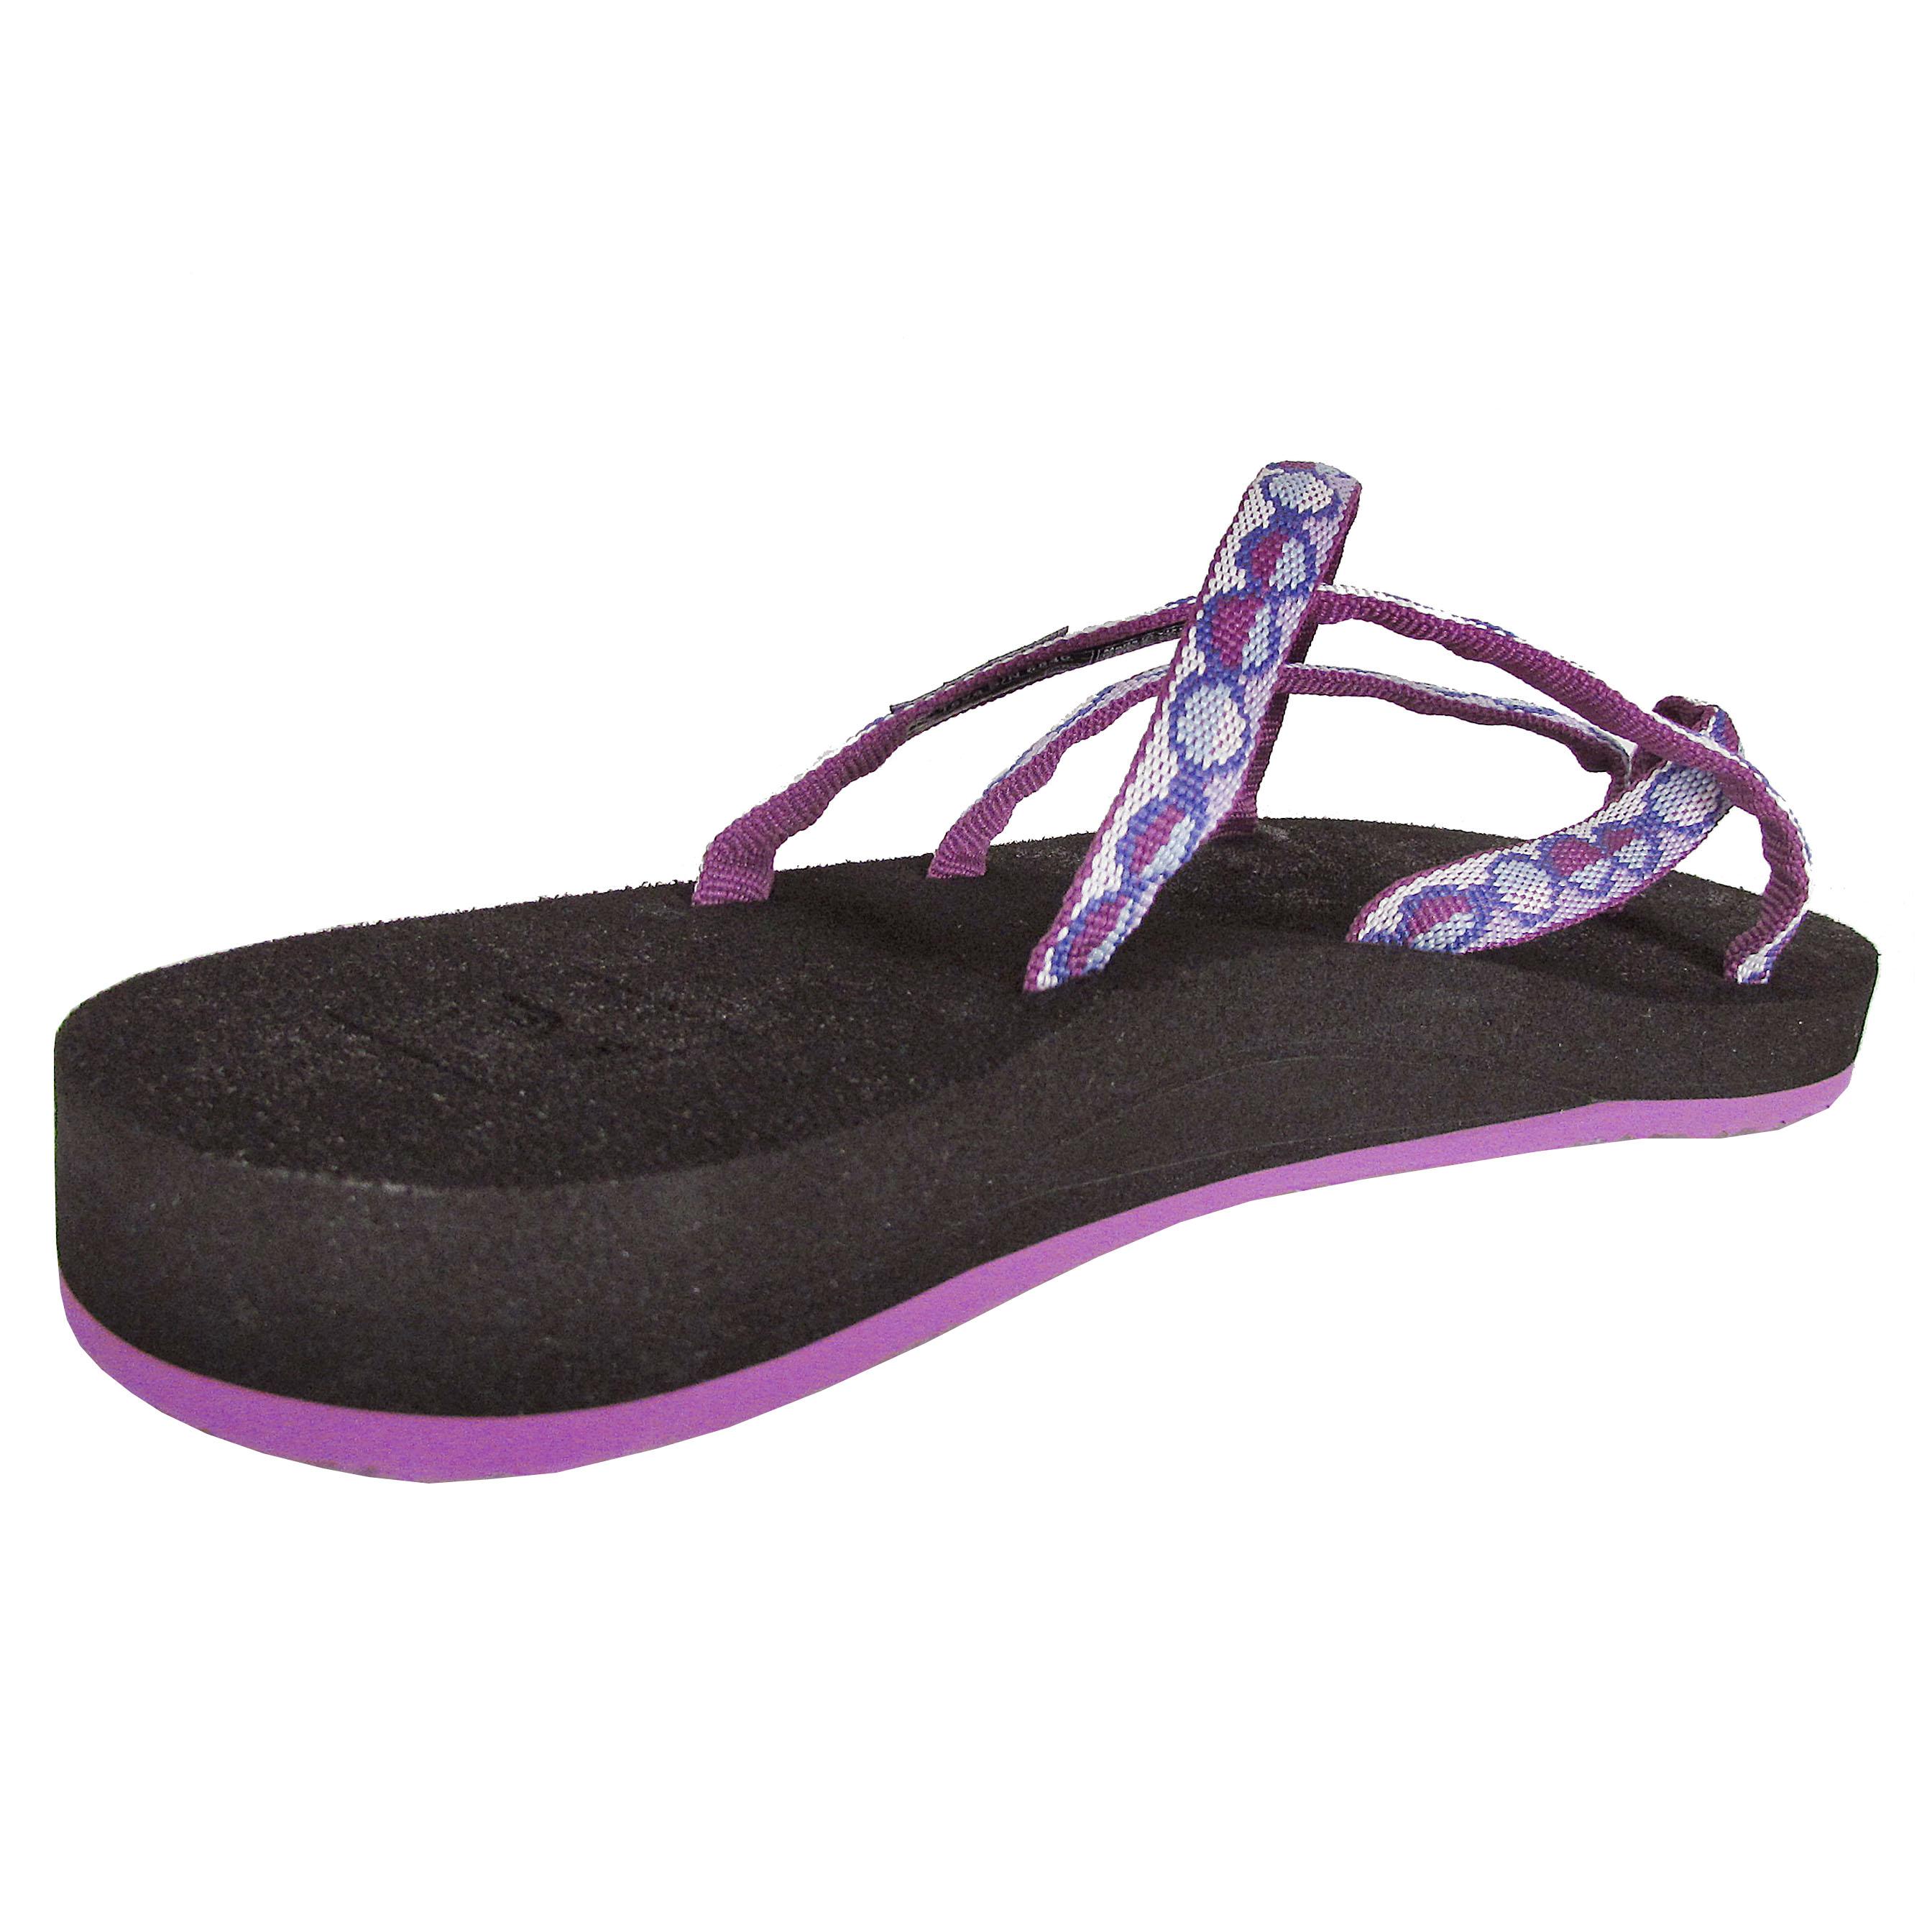 cb15389fa Teva Womens Olowahu Thong Flip Flop Sandal Shoes